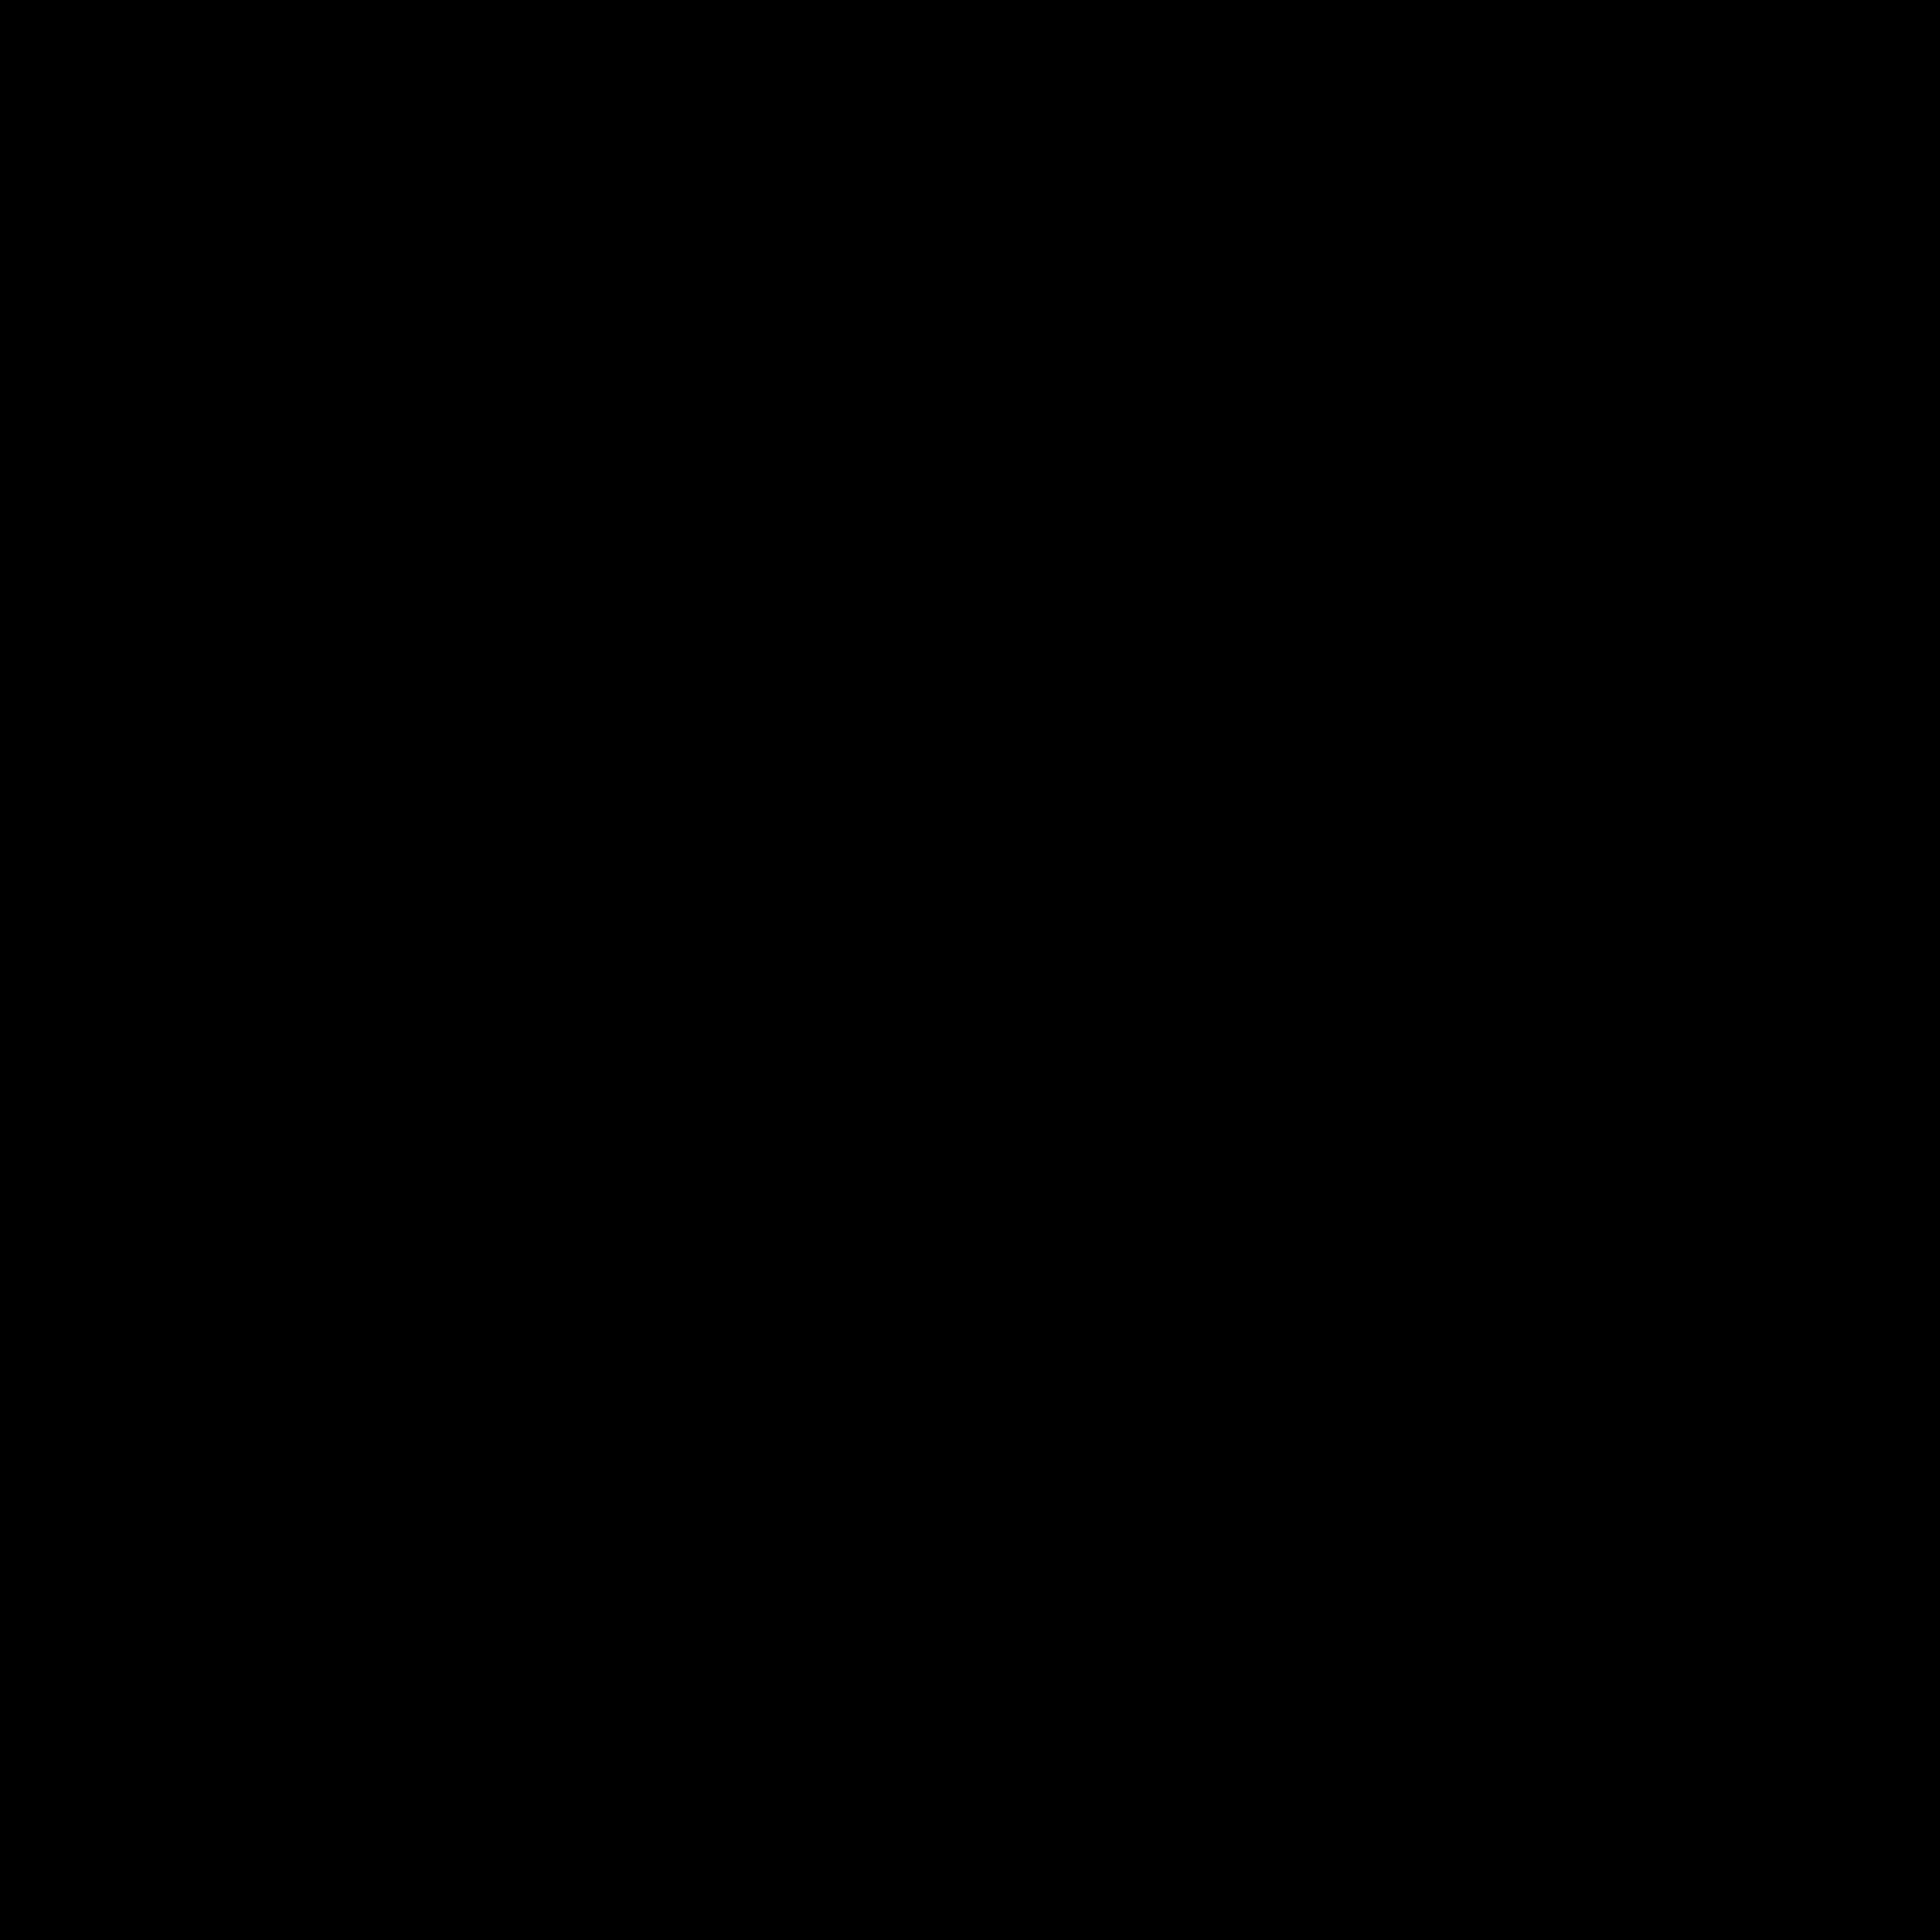 Basque Cross Vector - World Wide Clip Art Website • vector library